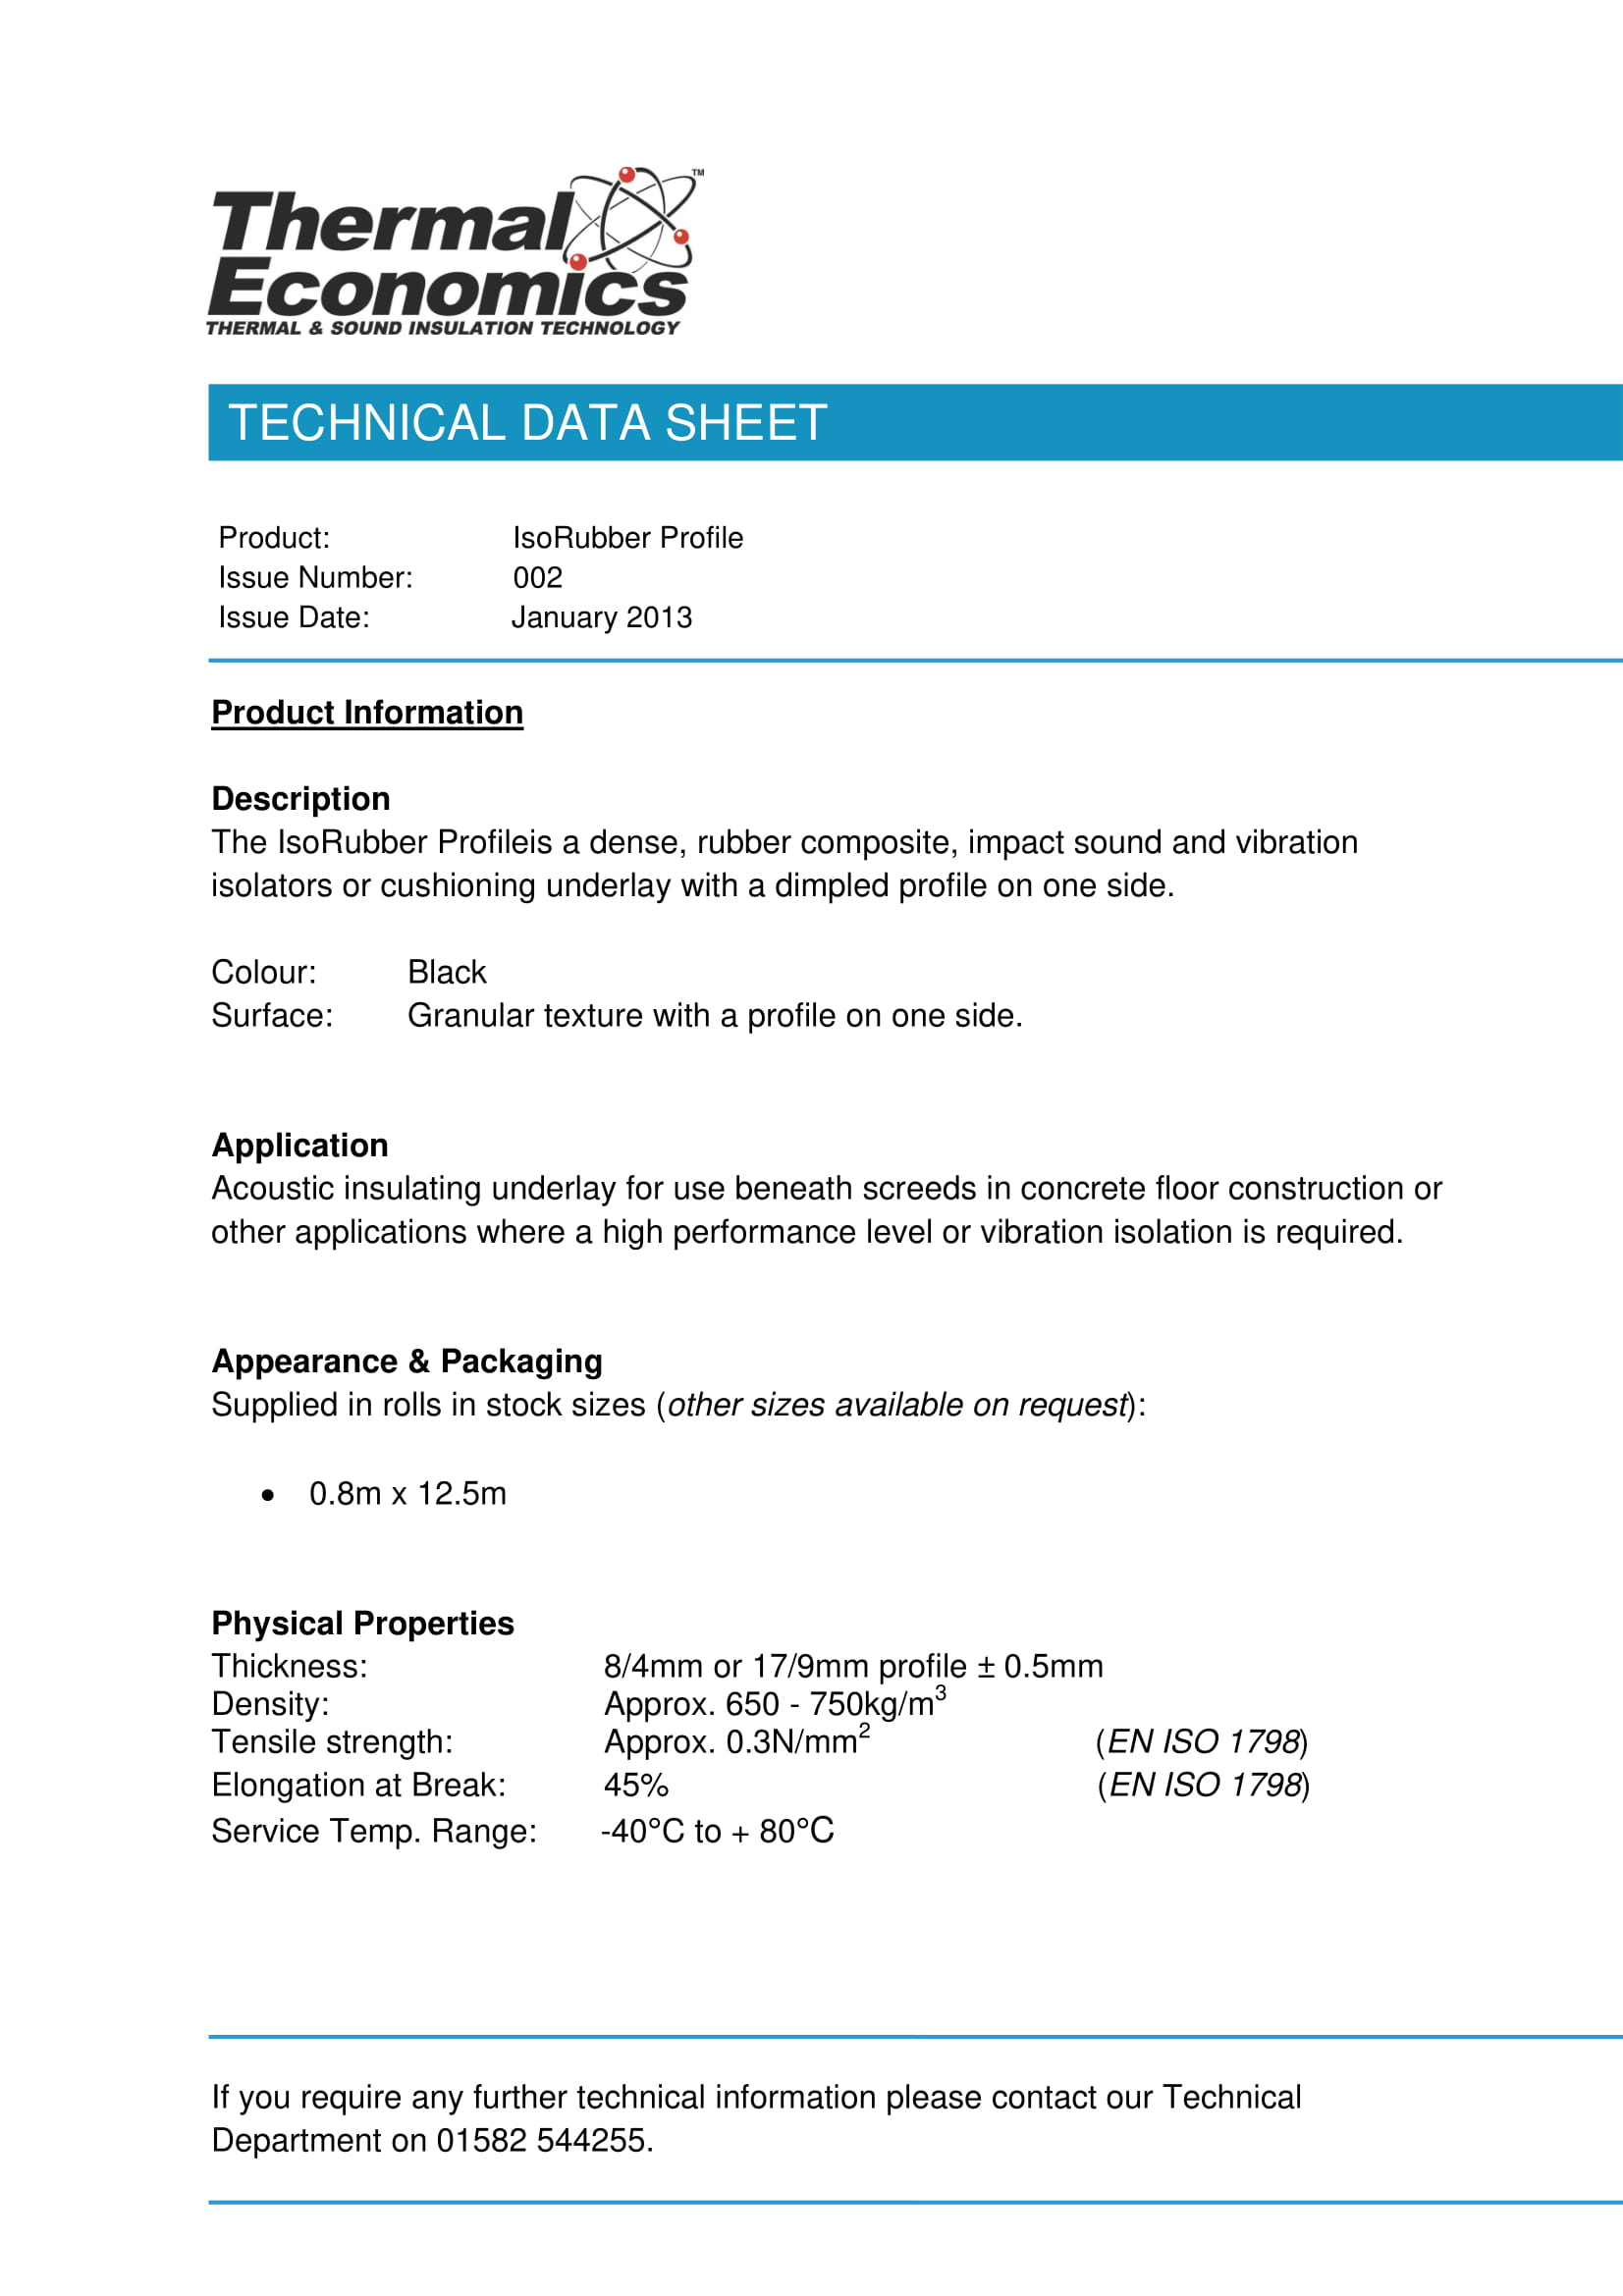 IsoRubber Profile Technical Data Sheet - Acoustic Technical Data